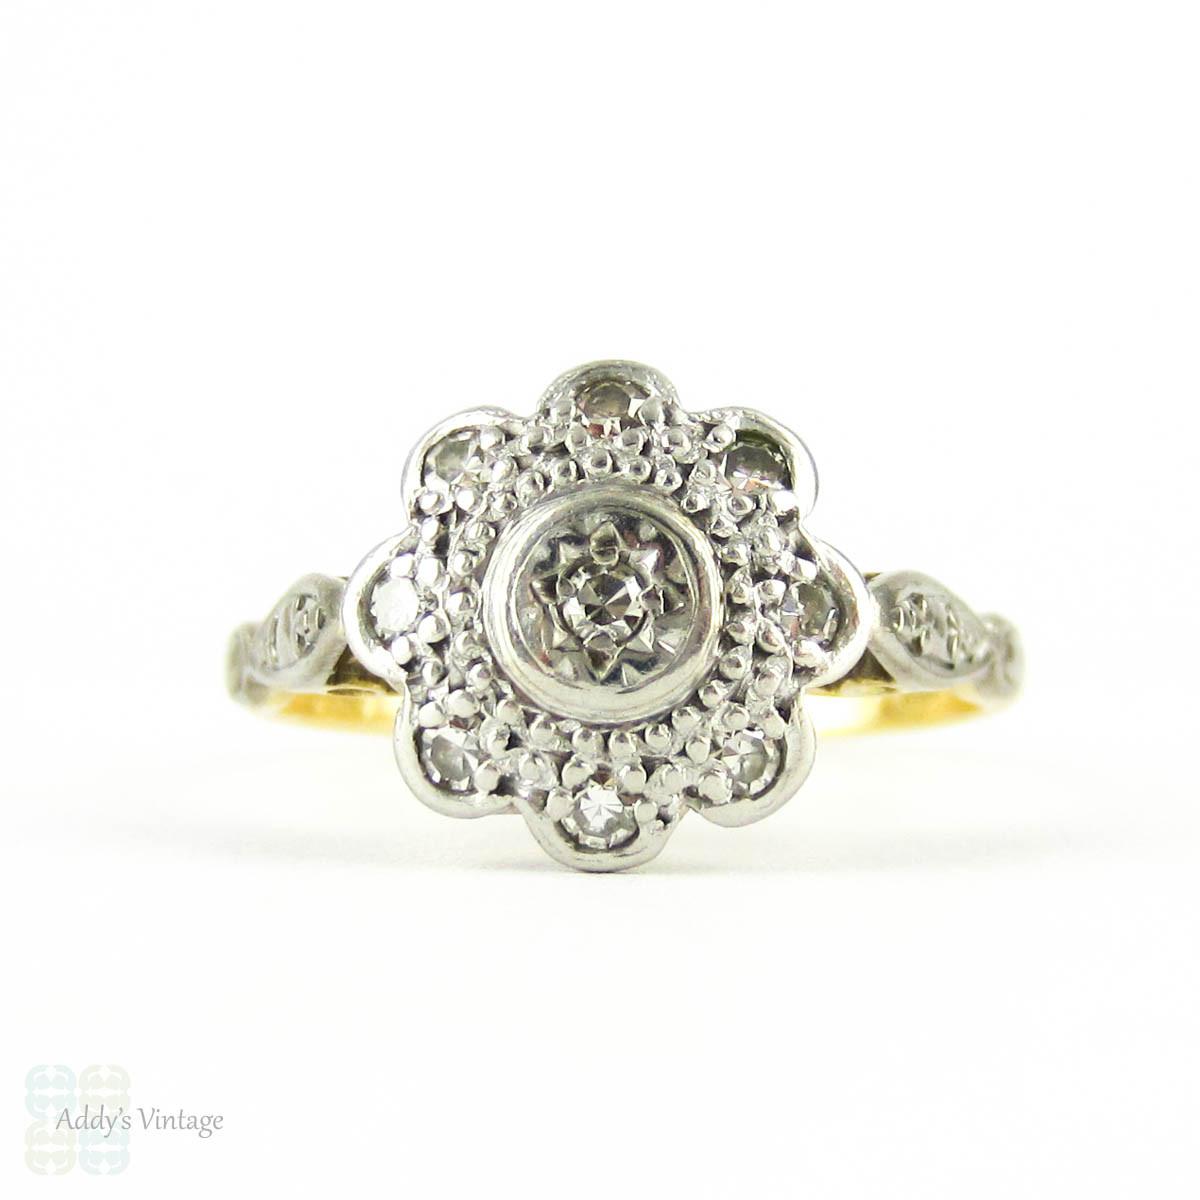 vintage diamond flower shape engagement ring 1960s diamond cluster ring in 18ct gold platinum. Black Bedroom Furniture Sets. Home Design Ideas